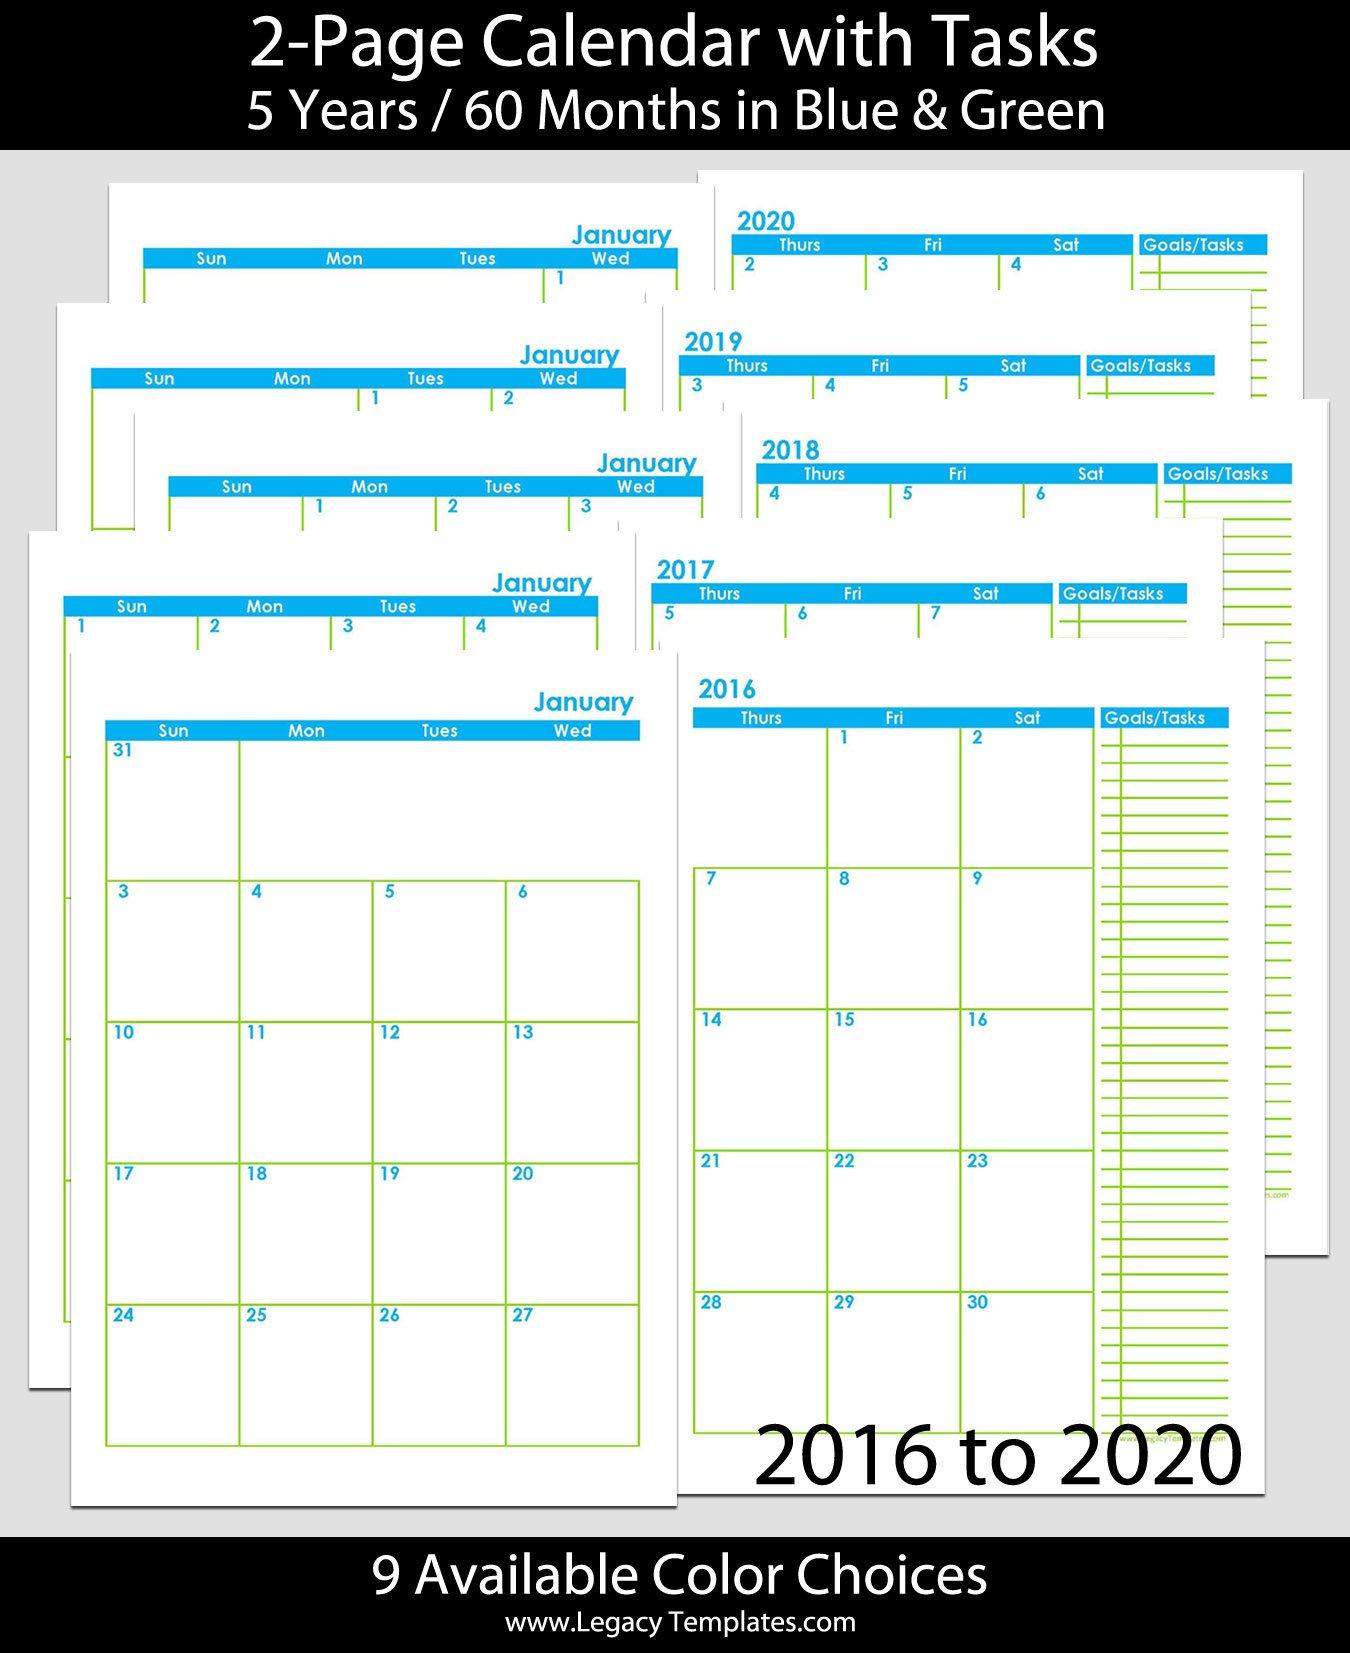 2016 Thru 2020 60 Months 2 Page Calendar – A5   Legacy Free Printable 8 X 11 May Calendar